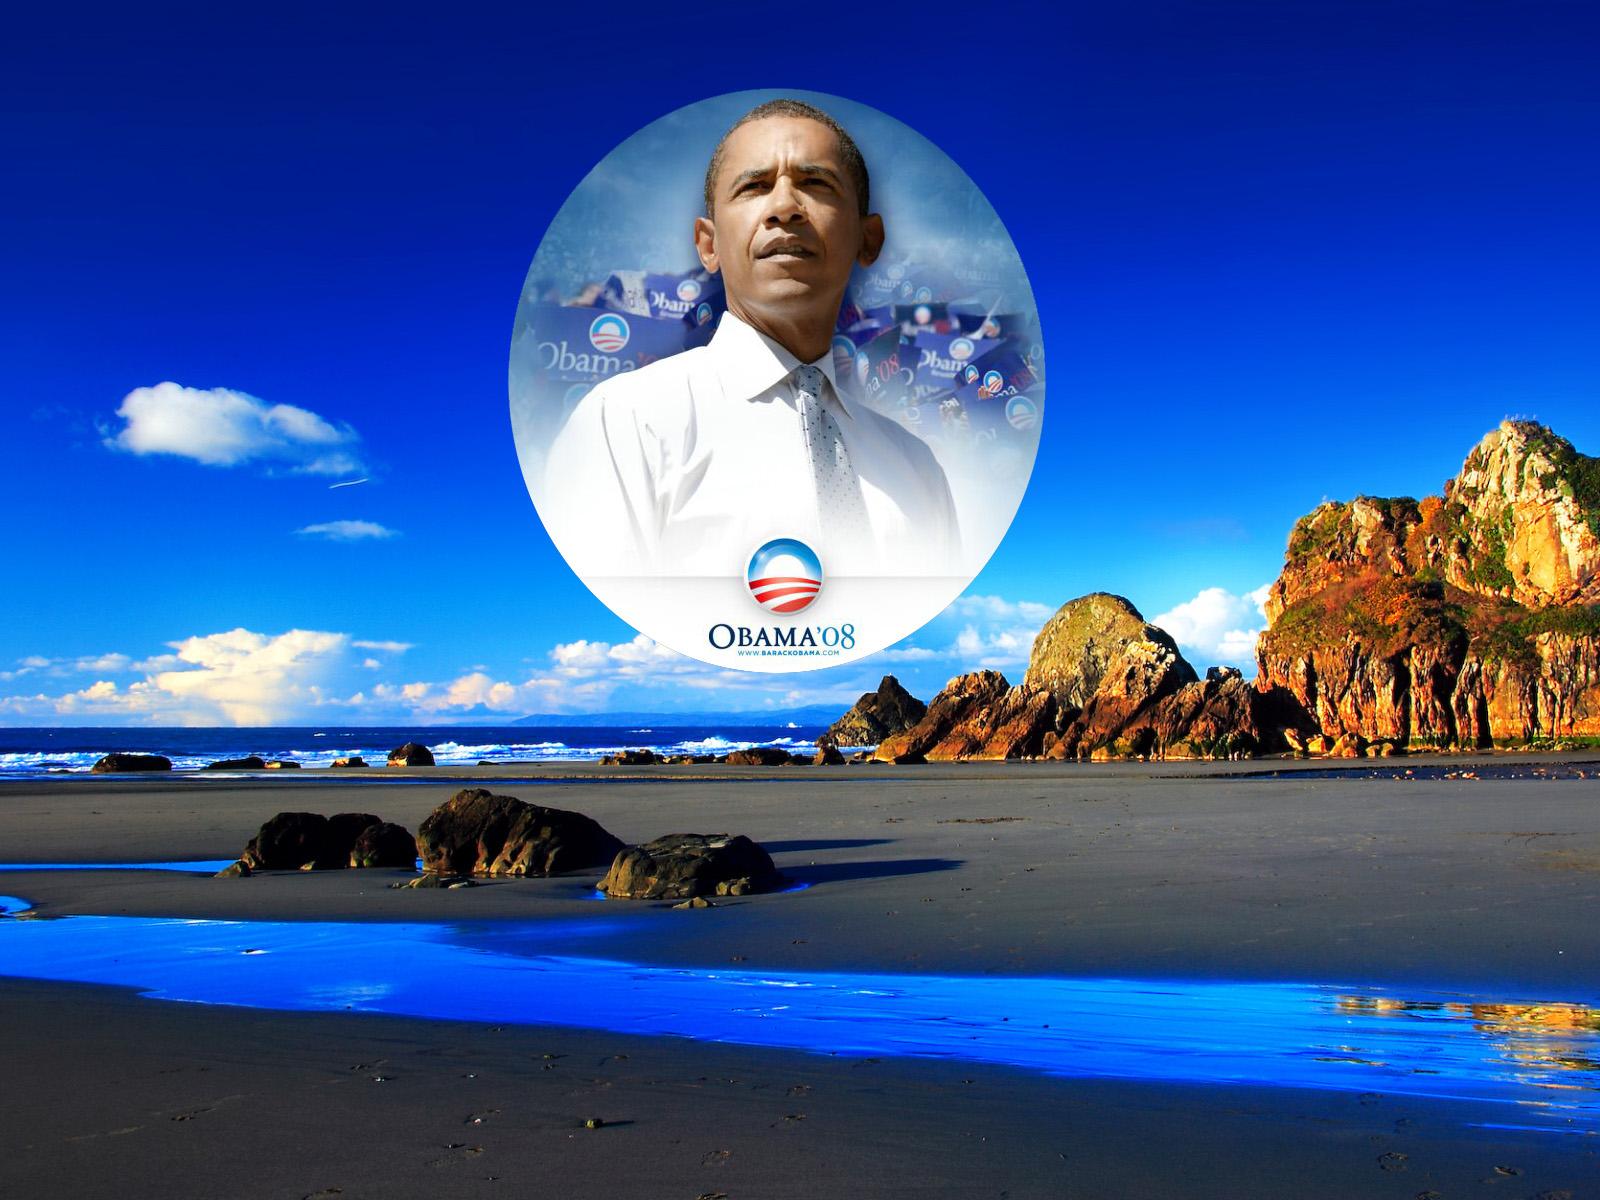 Wallpaper Obama 1600x1200